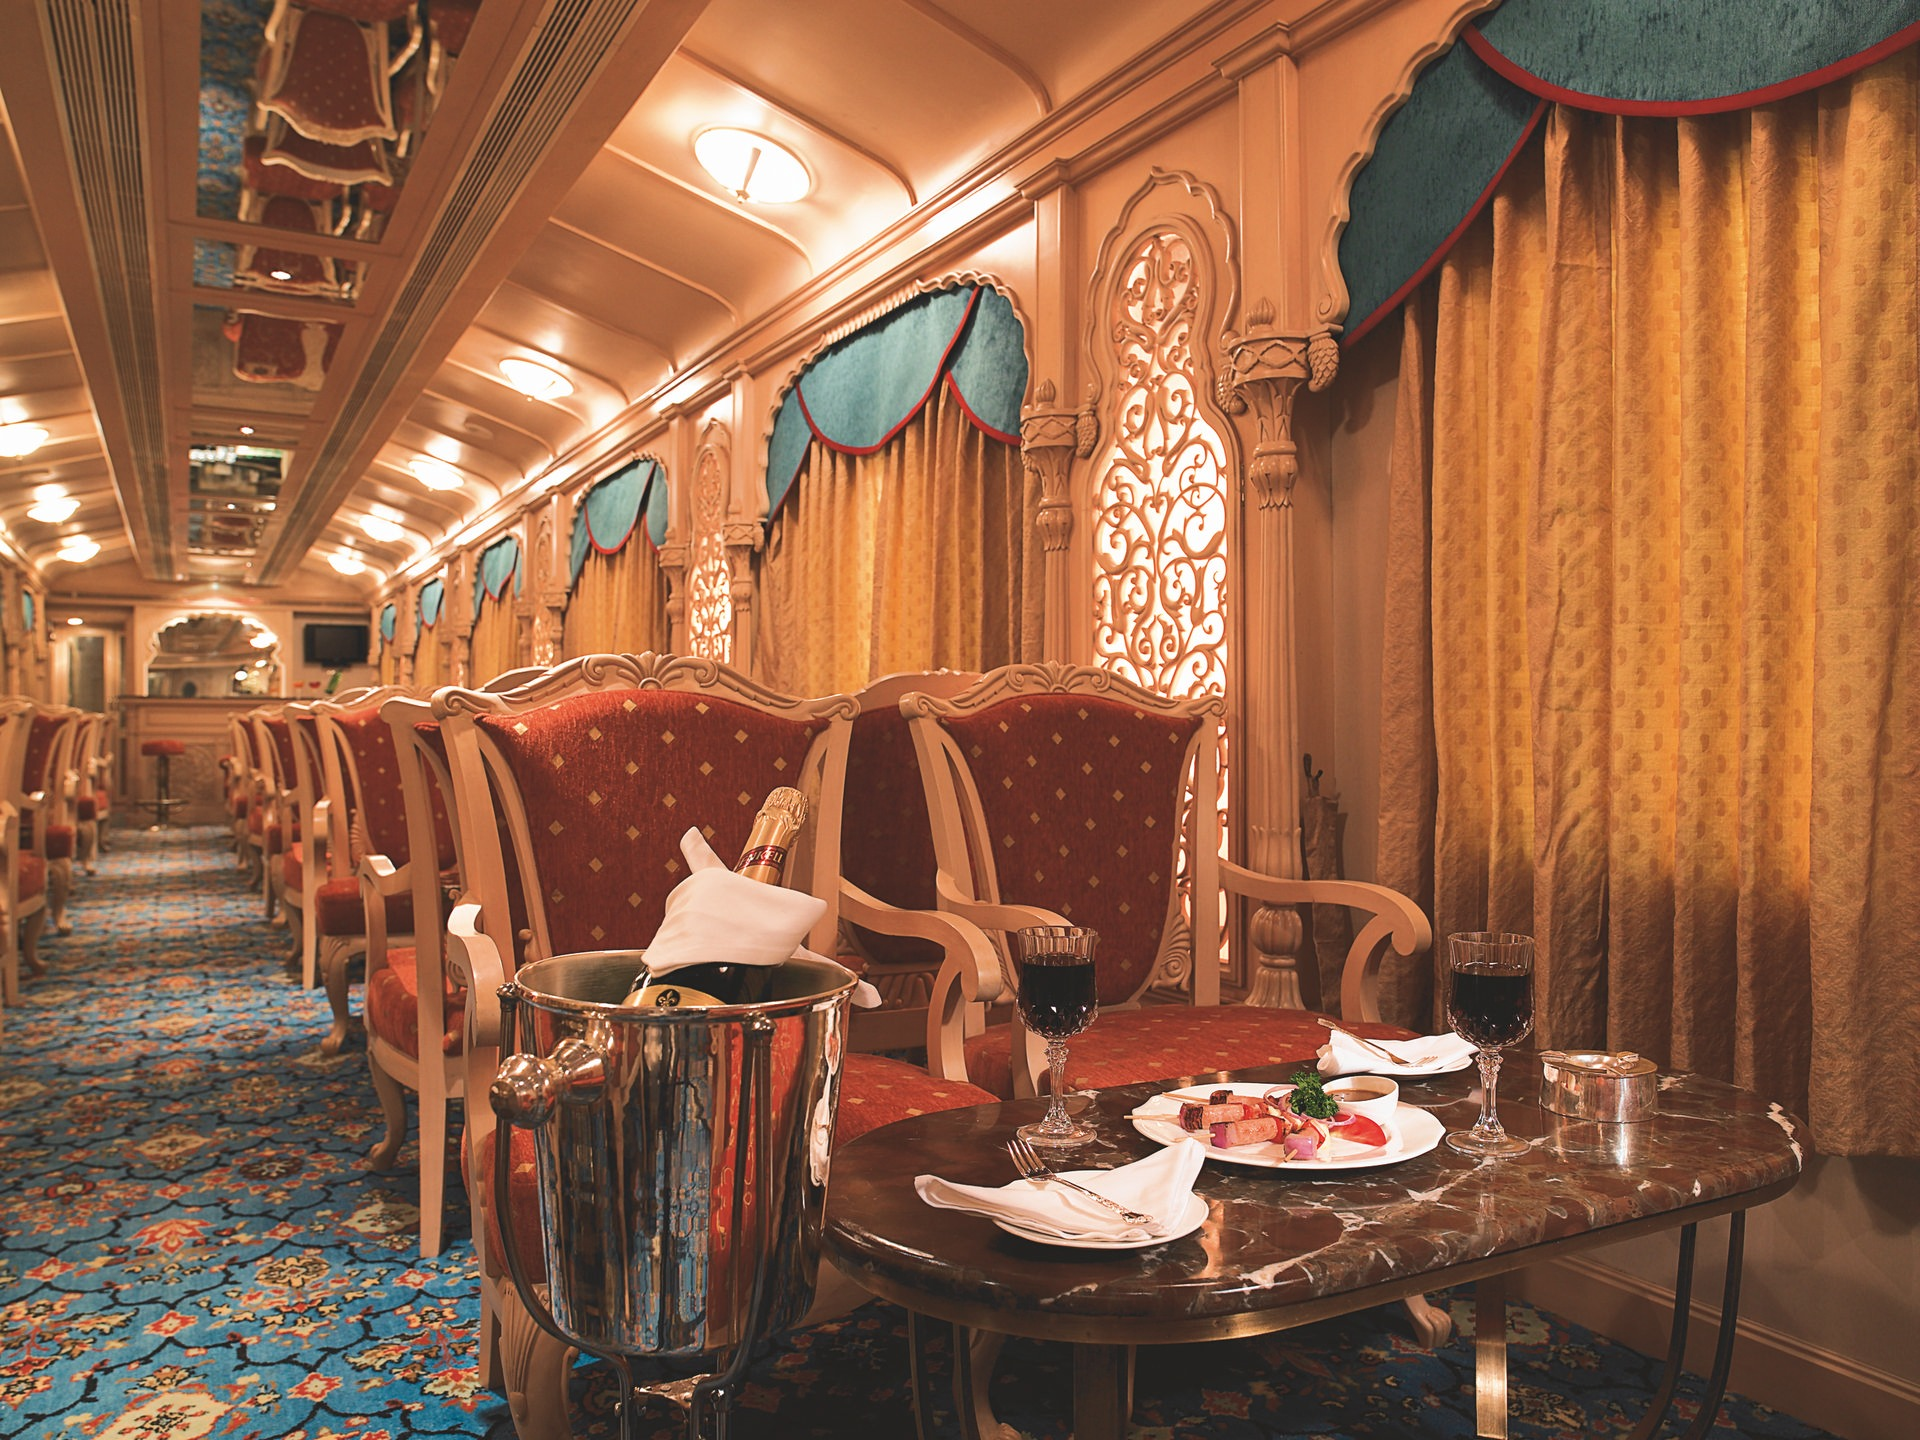 NOMAD-luksusowe-pociągi-Golden-Chariot-Indie-01